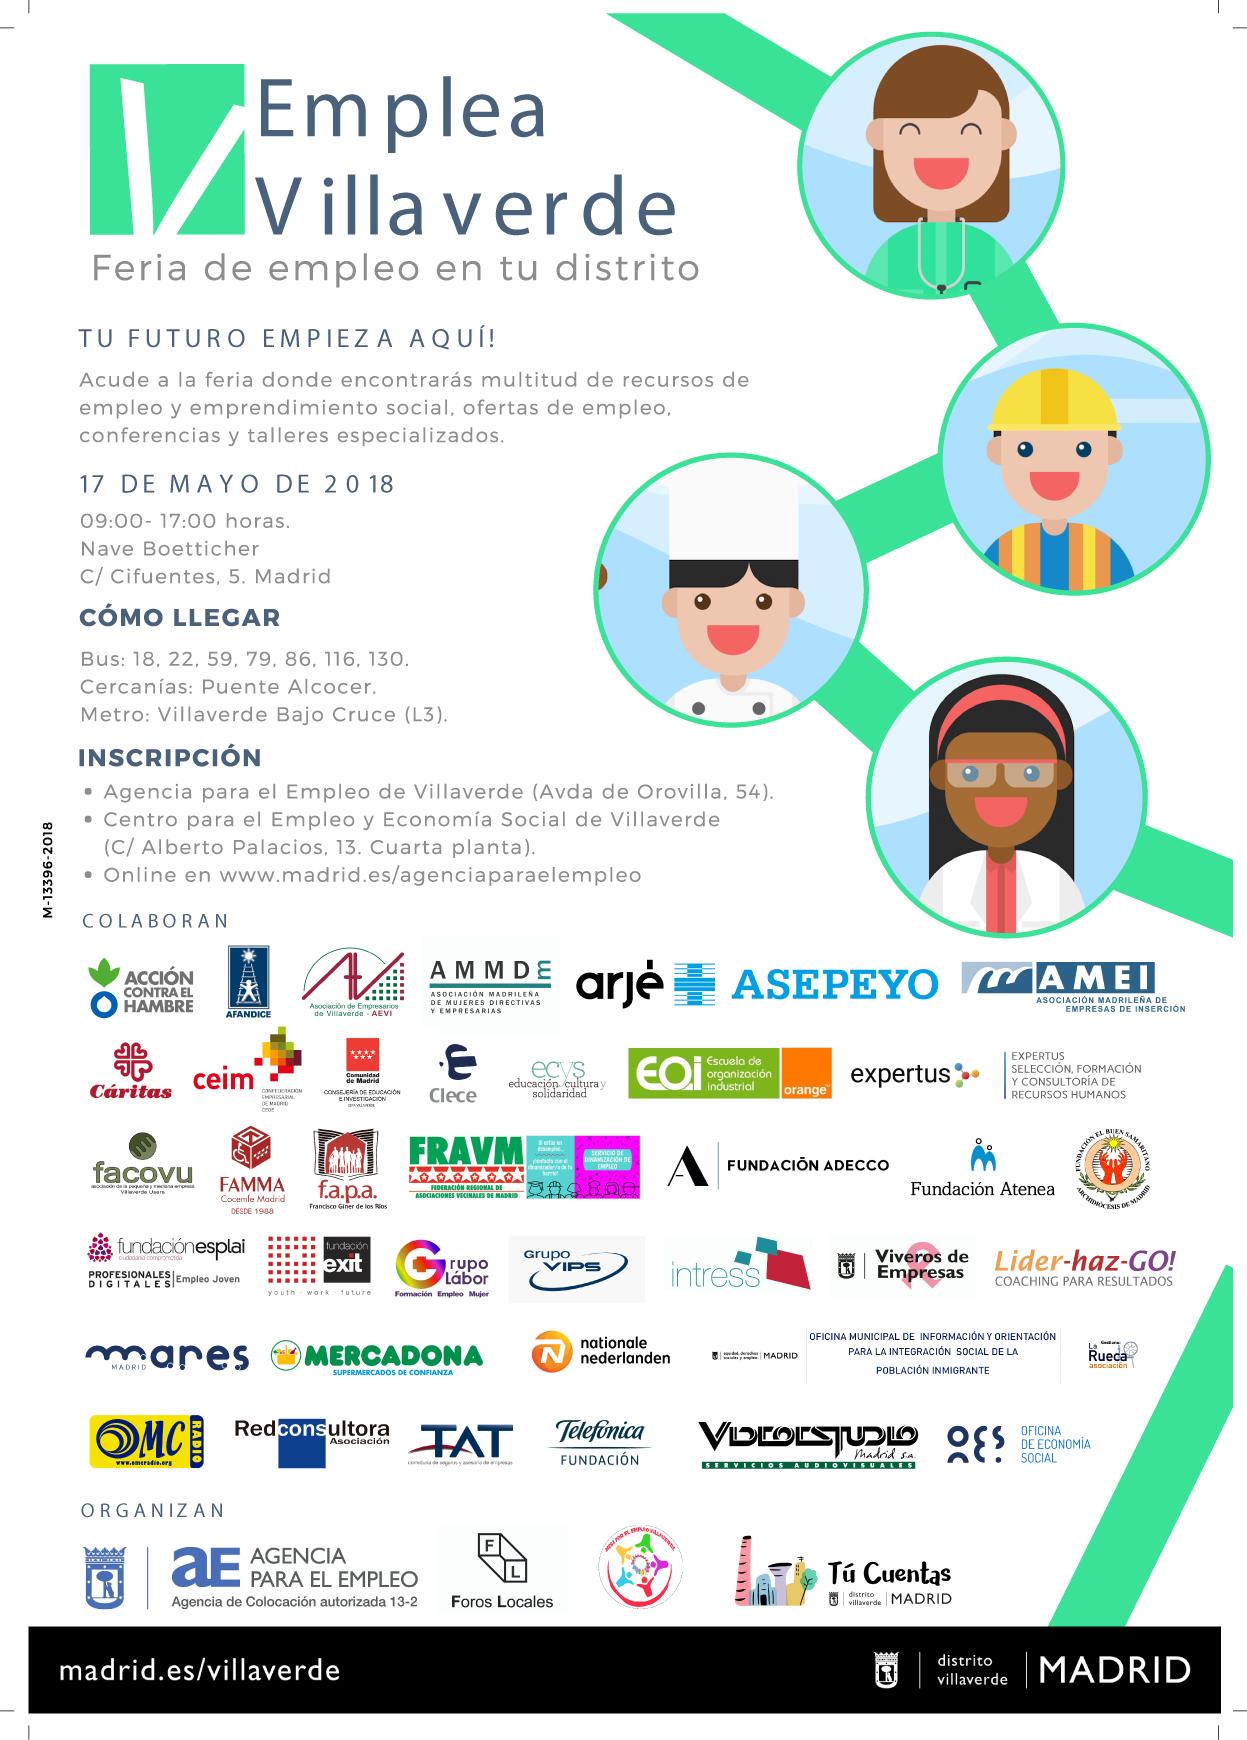 I Feria de Empleo de Villaverde - fundacionsomosaraarraigo